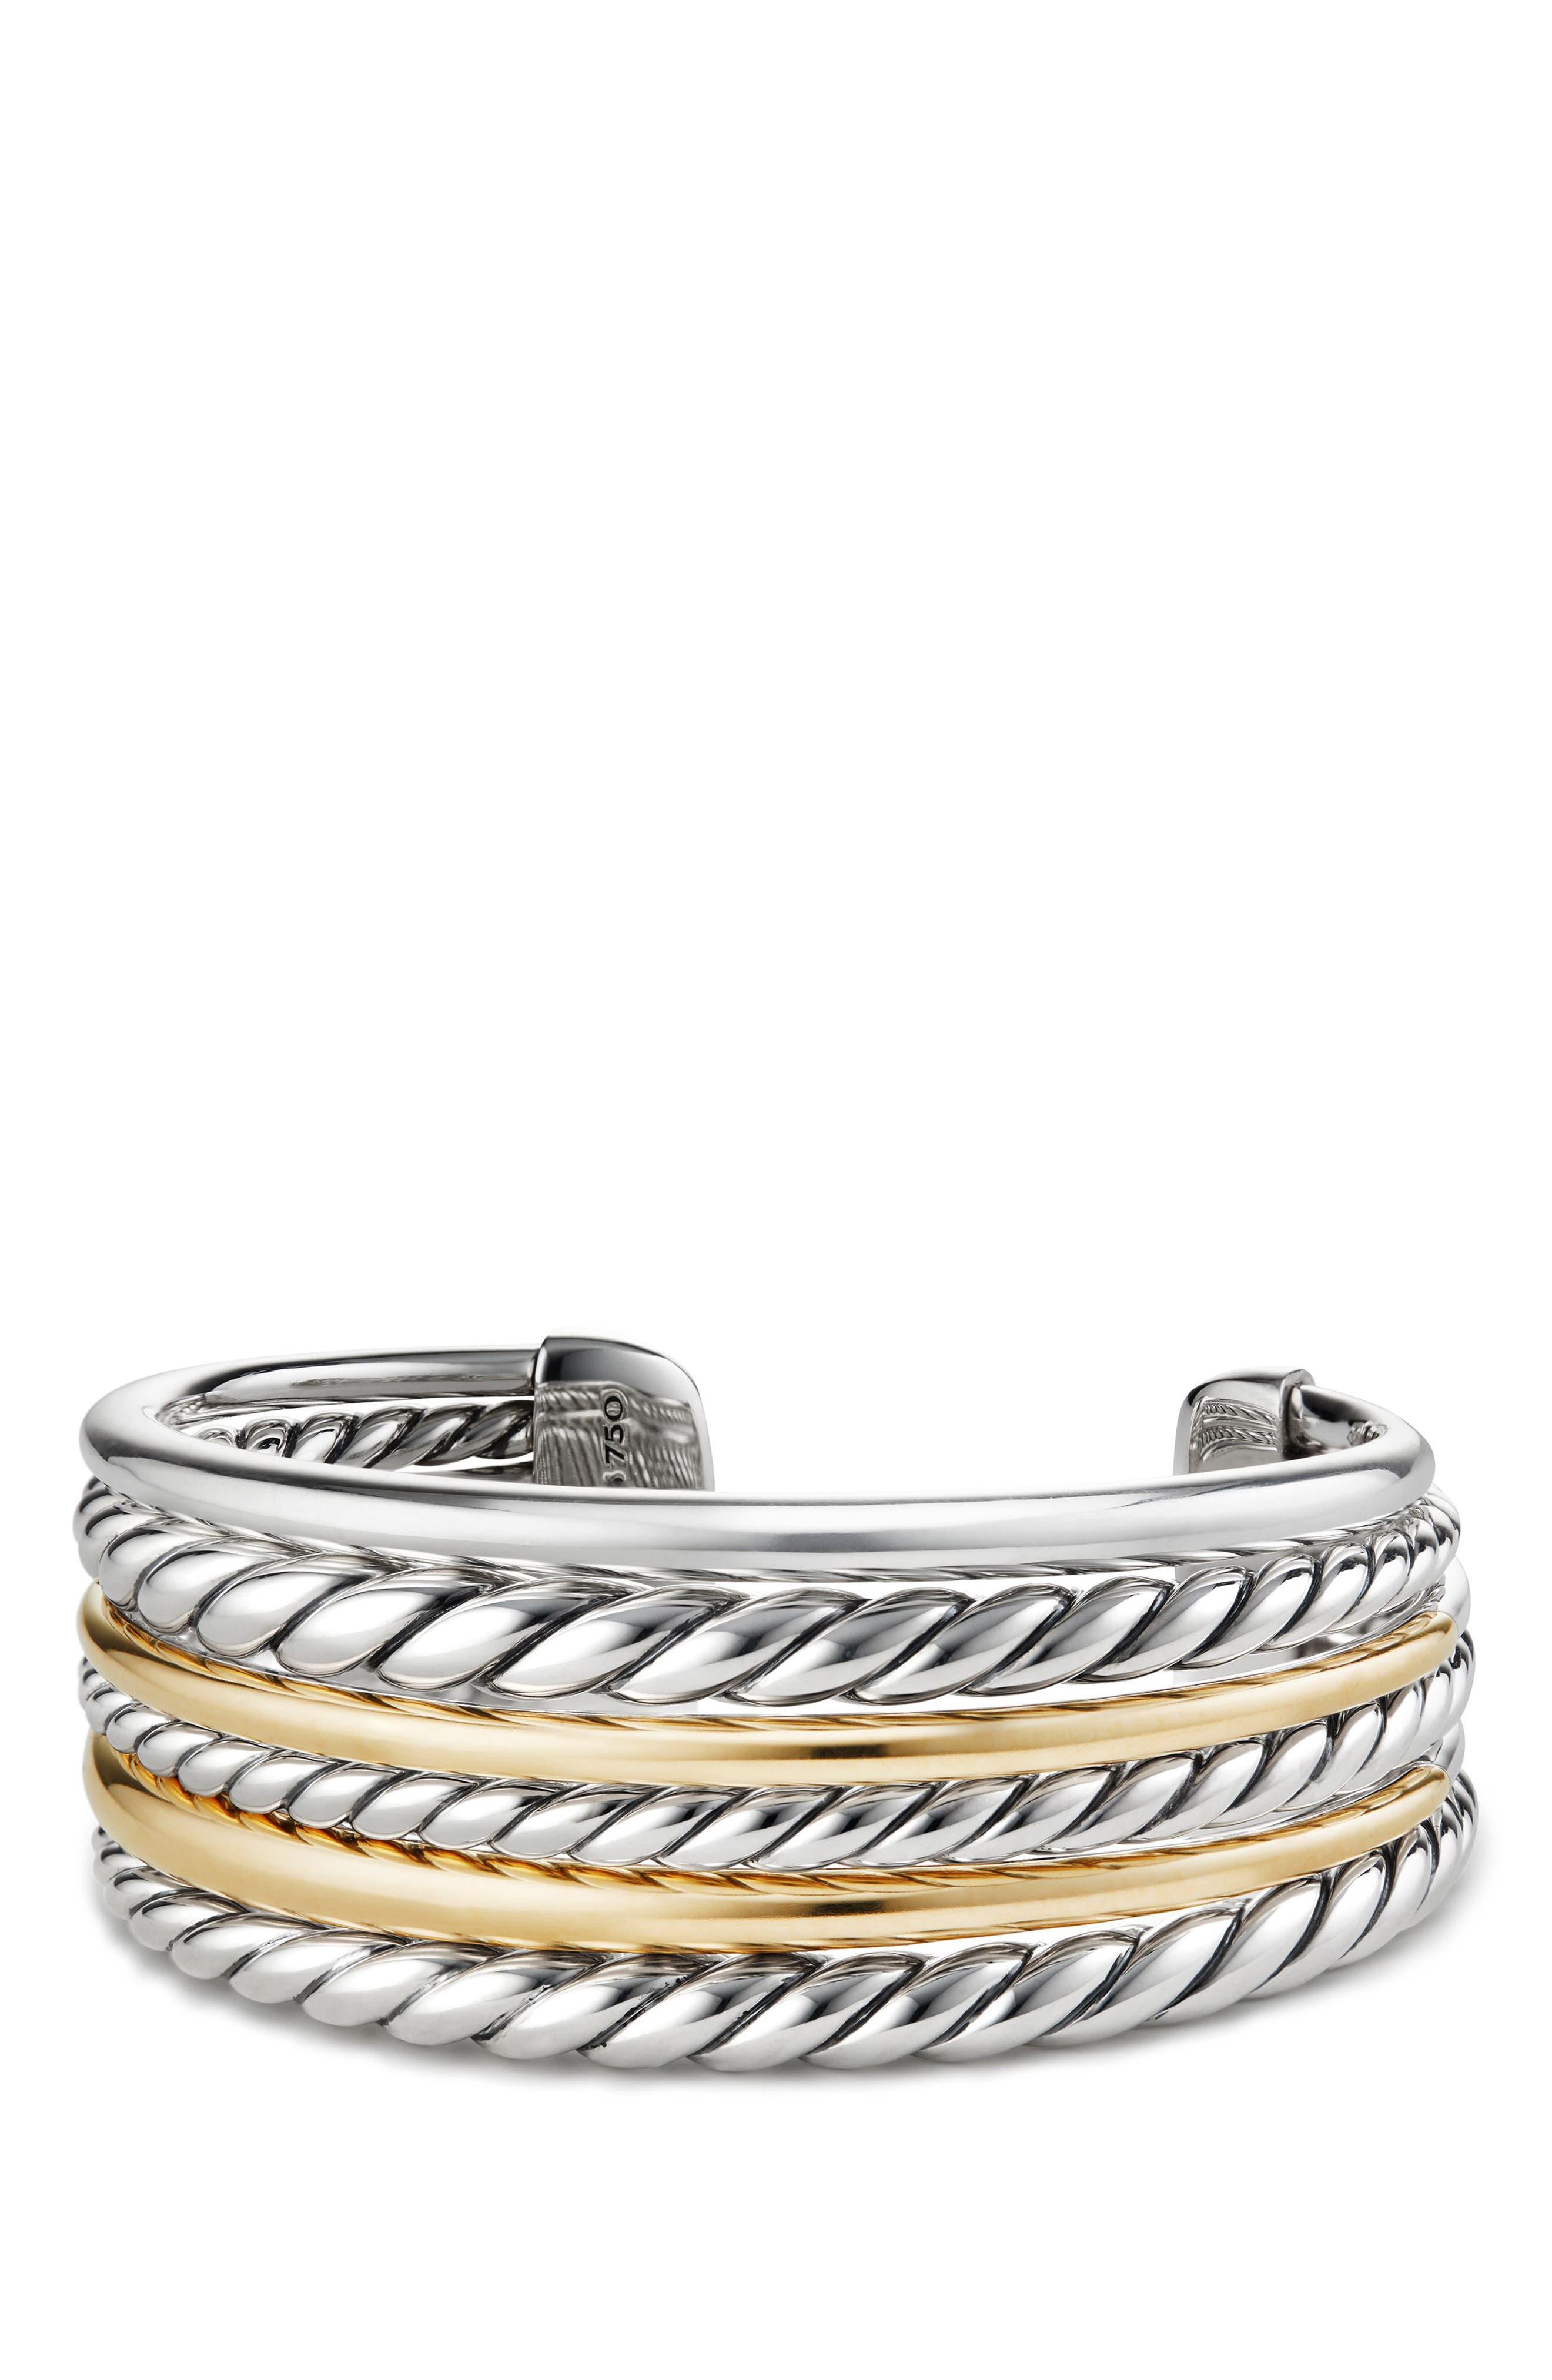 Main Image - David Yurman Pure Form® Cuff Bracelet